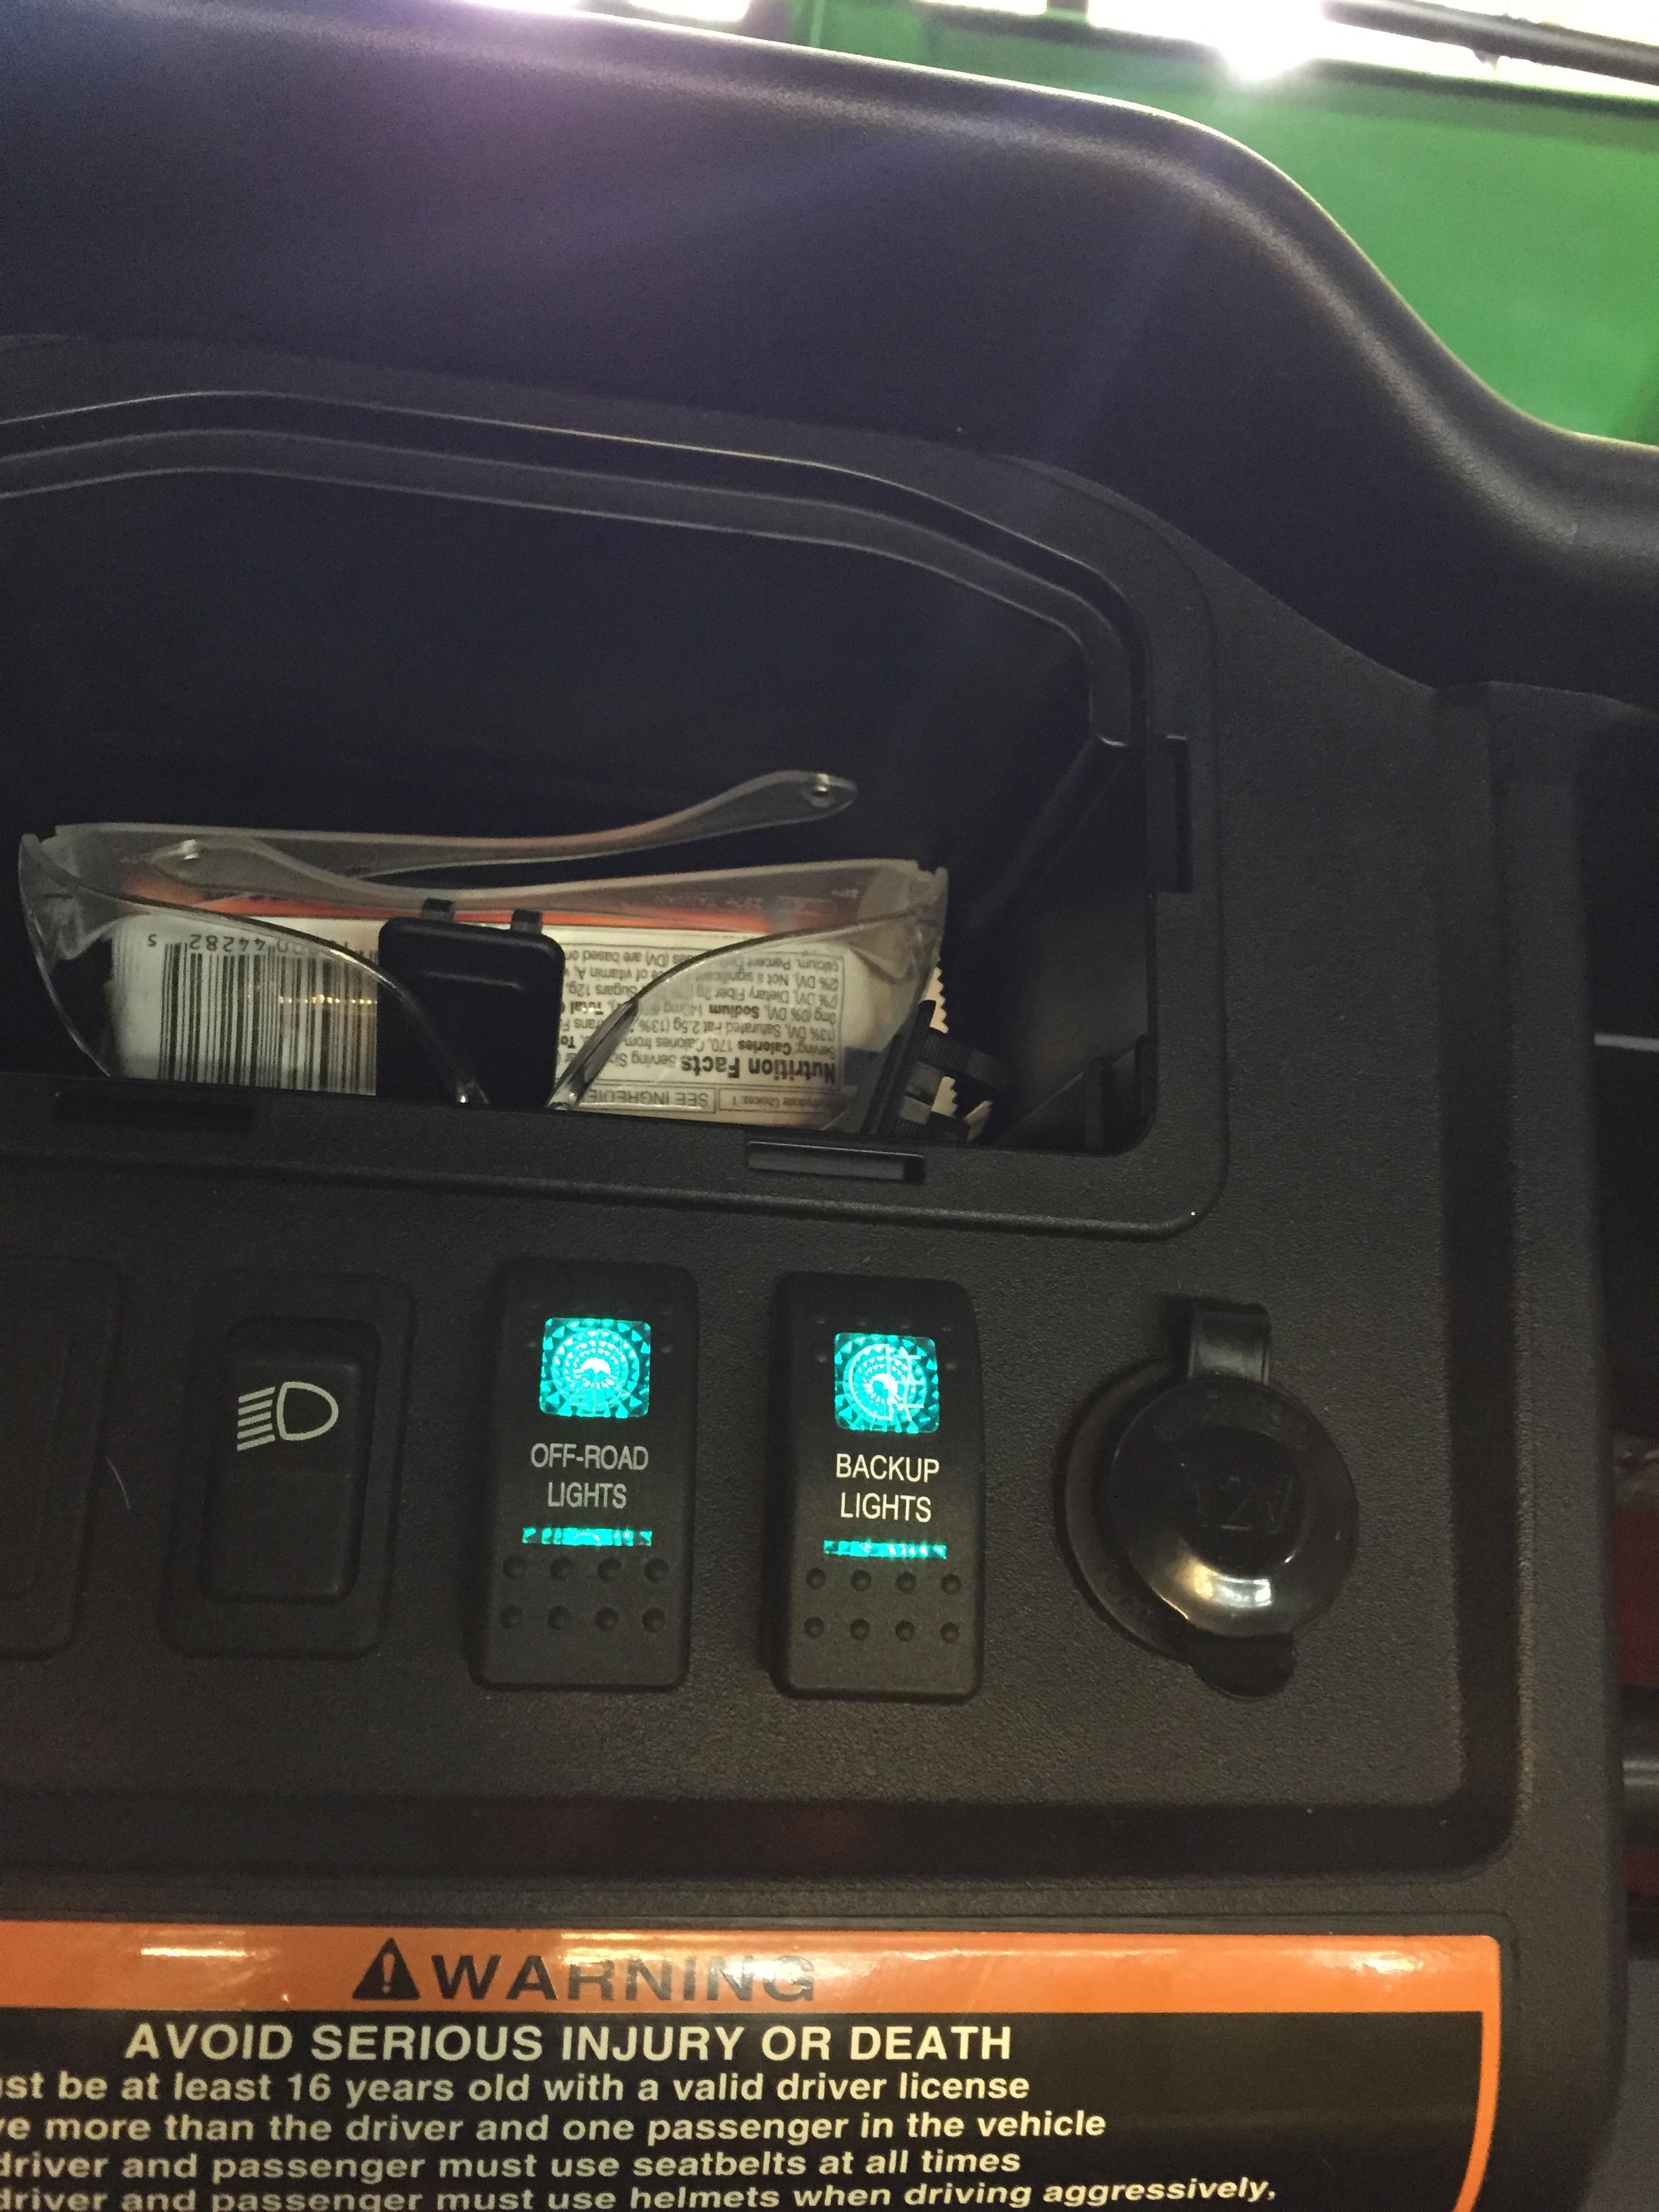 4457d1483198391 825 lights key switch 825 with lights john deere gator forums John Deere Gator Starter Wiring Diagram at bayanpartner.co